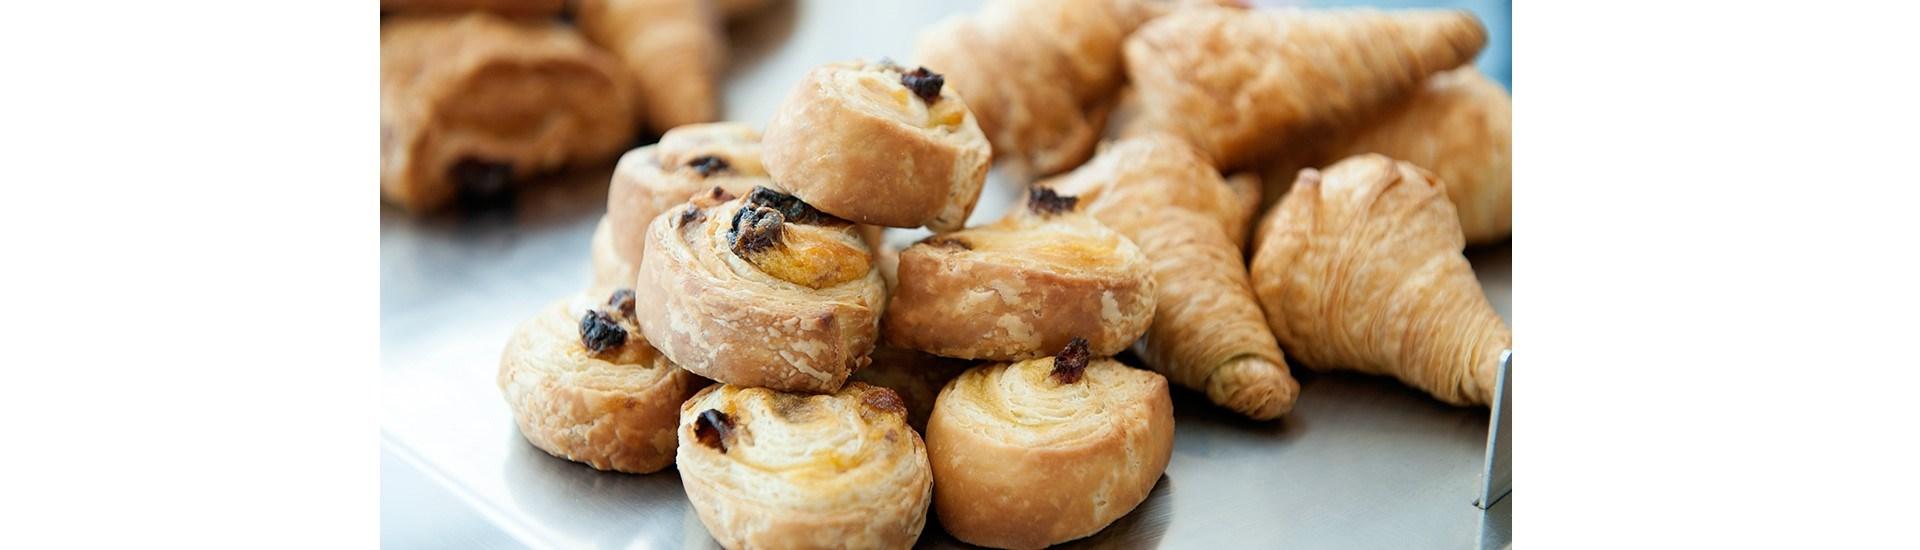 CroissantWebsite_1484847269681